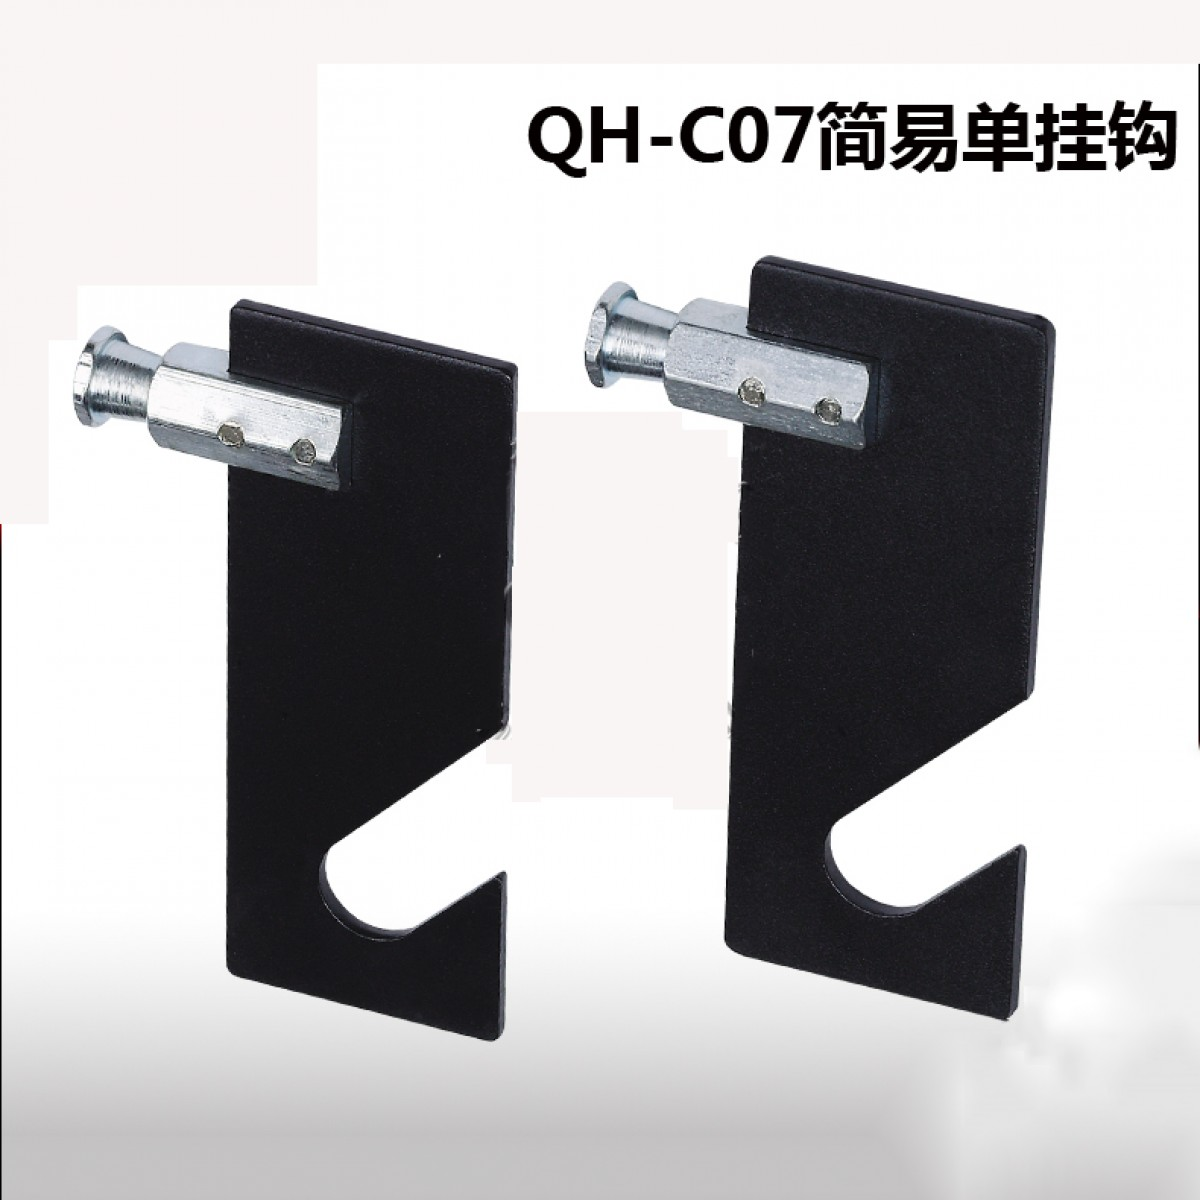 Qihe起鹤牌QH-C07单轴手动背景架挂钩 天地撑杆附件